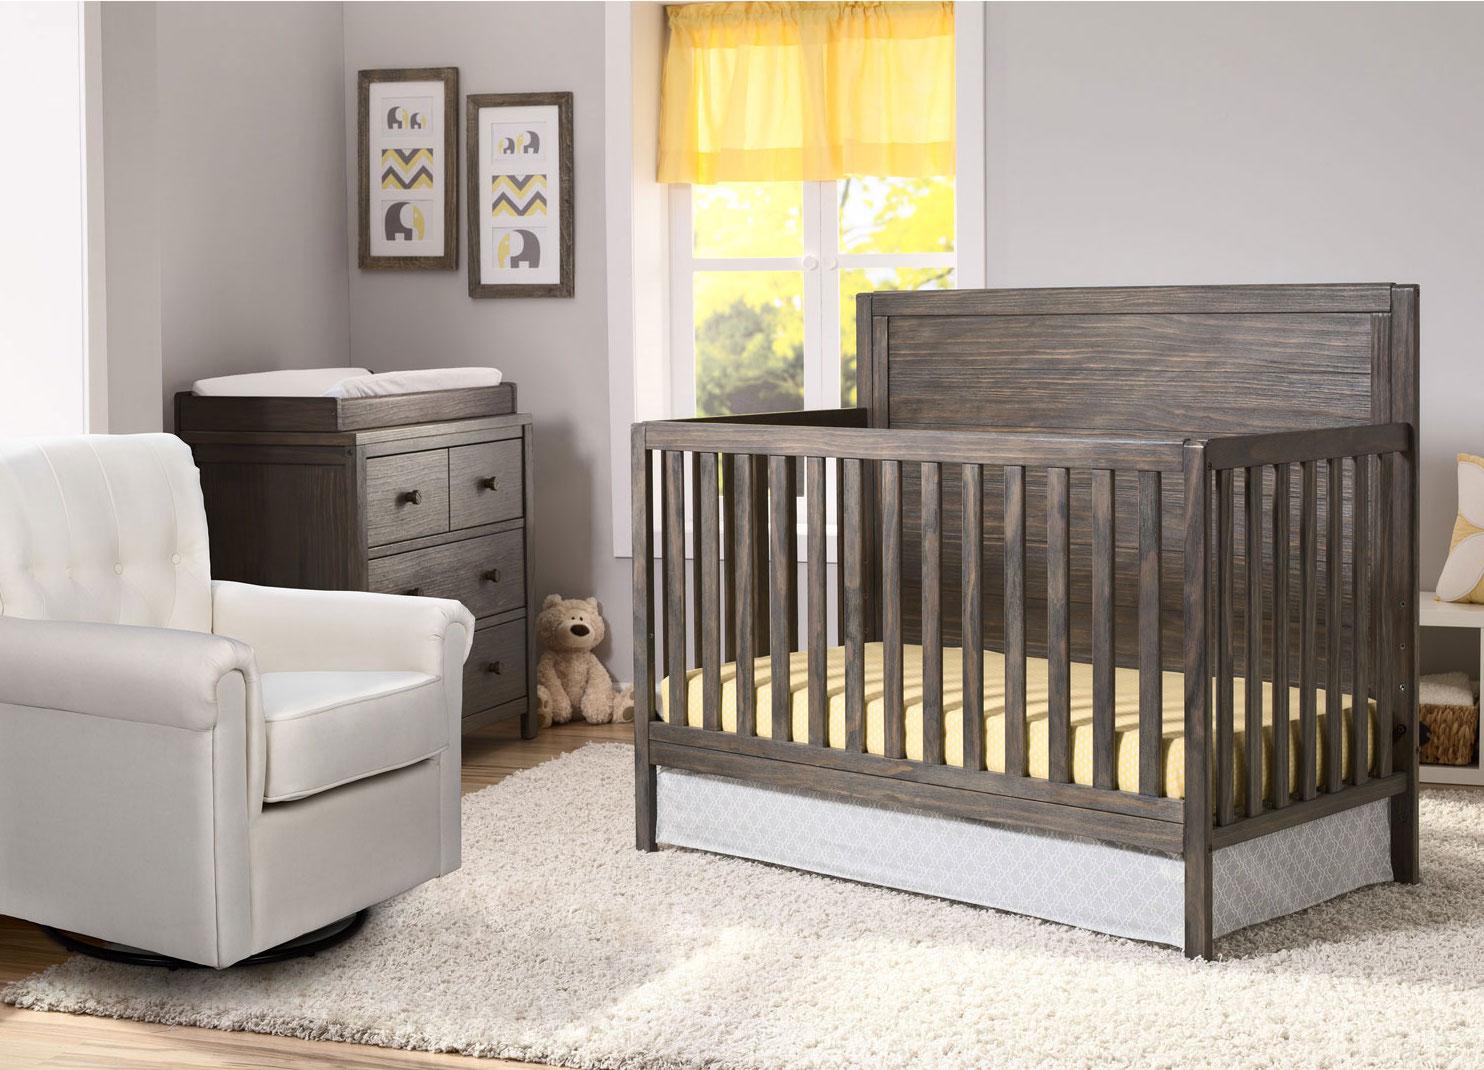 bundle baby gear - delta children cambridge nursery package